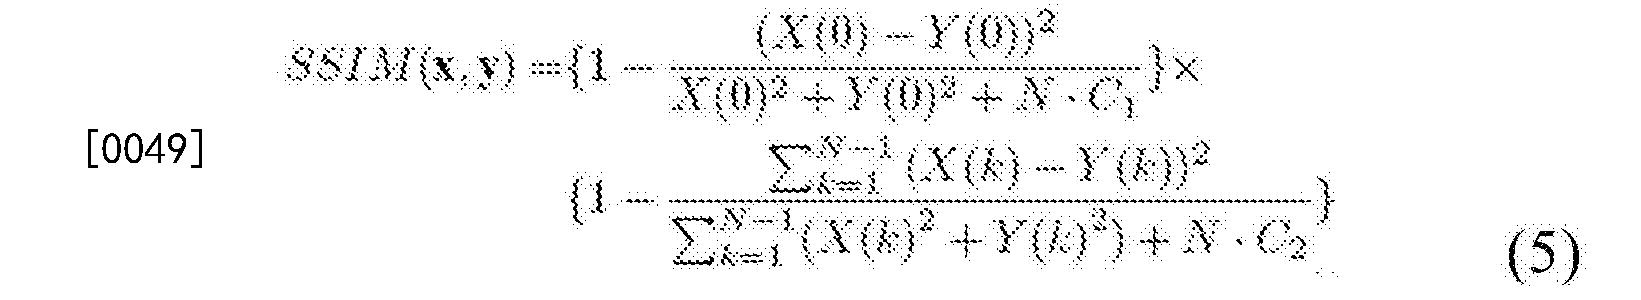 CN103918262B - Distortion Optimization perceptual video